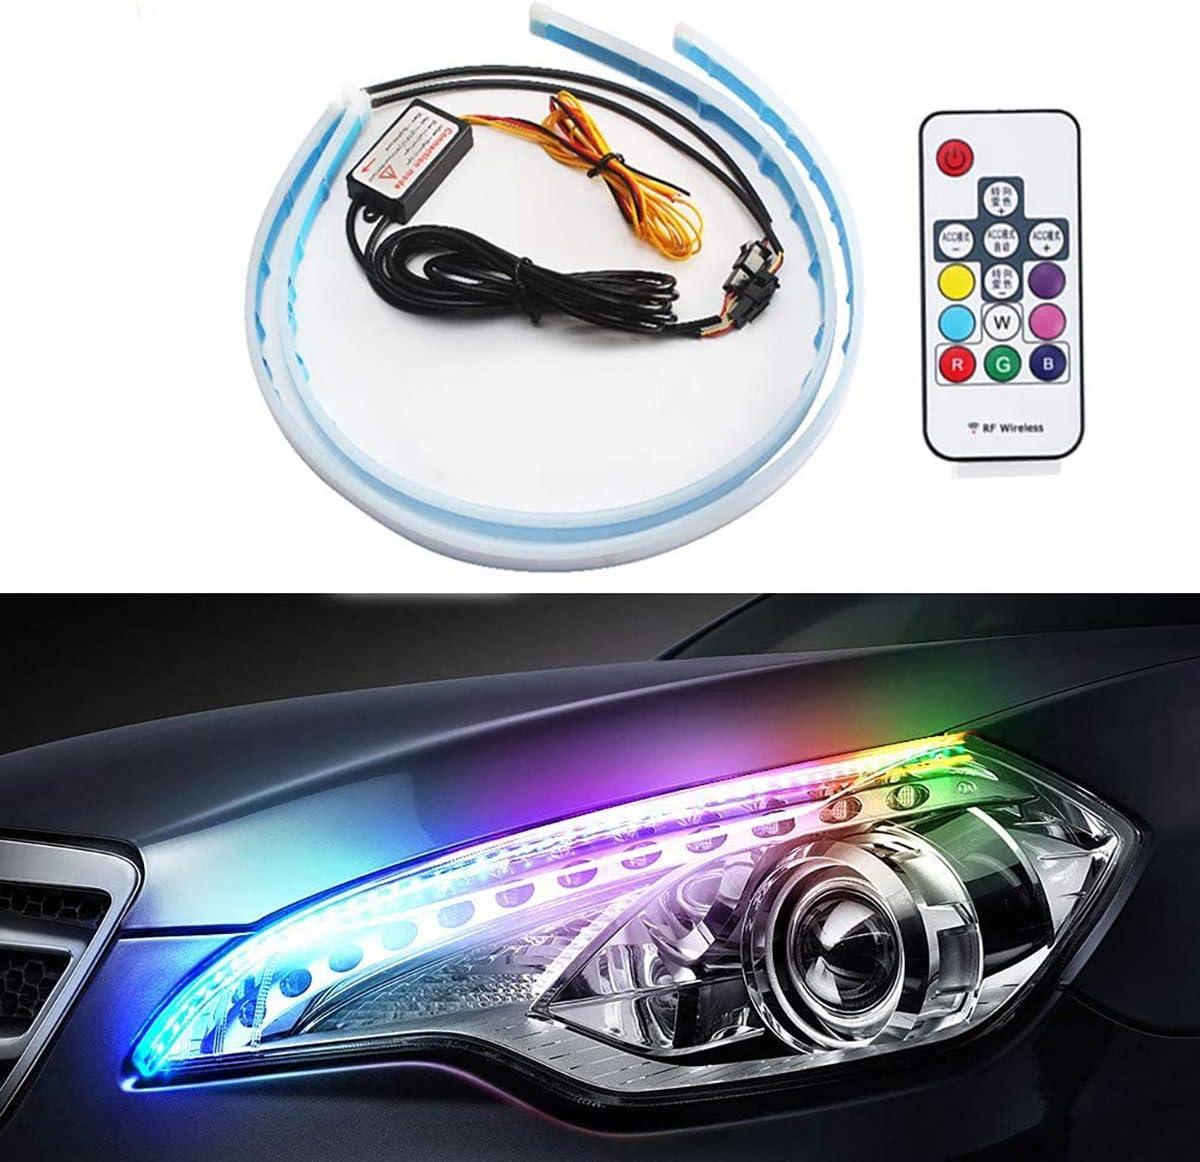 Flexible OFFicial Denver Mall site Car LED Strip Light - 2 Ligh Pcs 24 inch RGB Waterproof